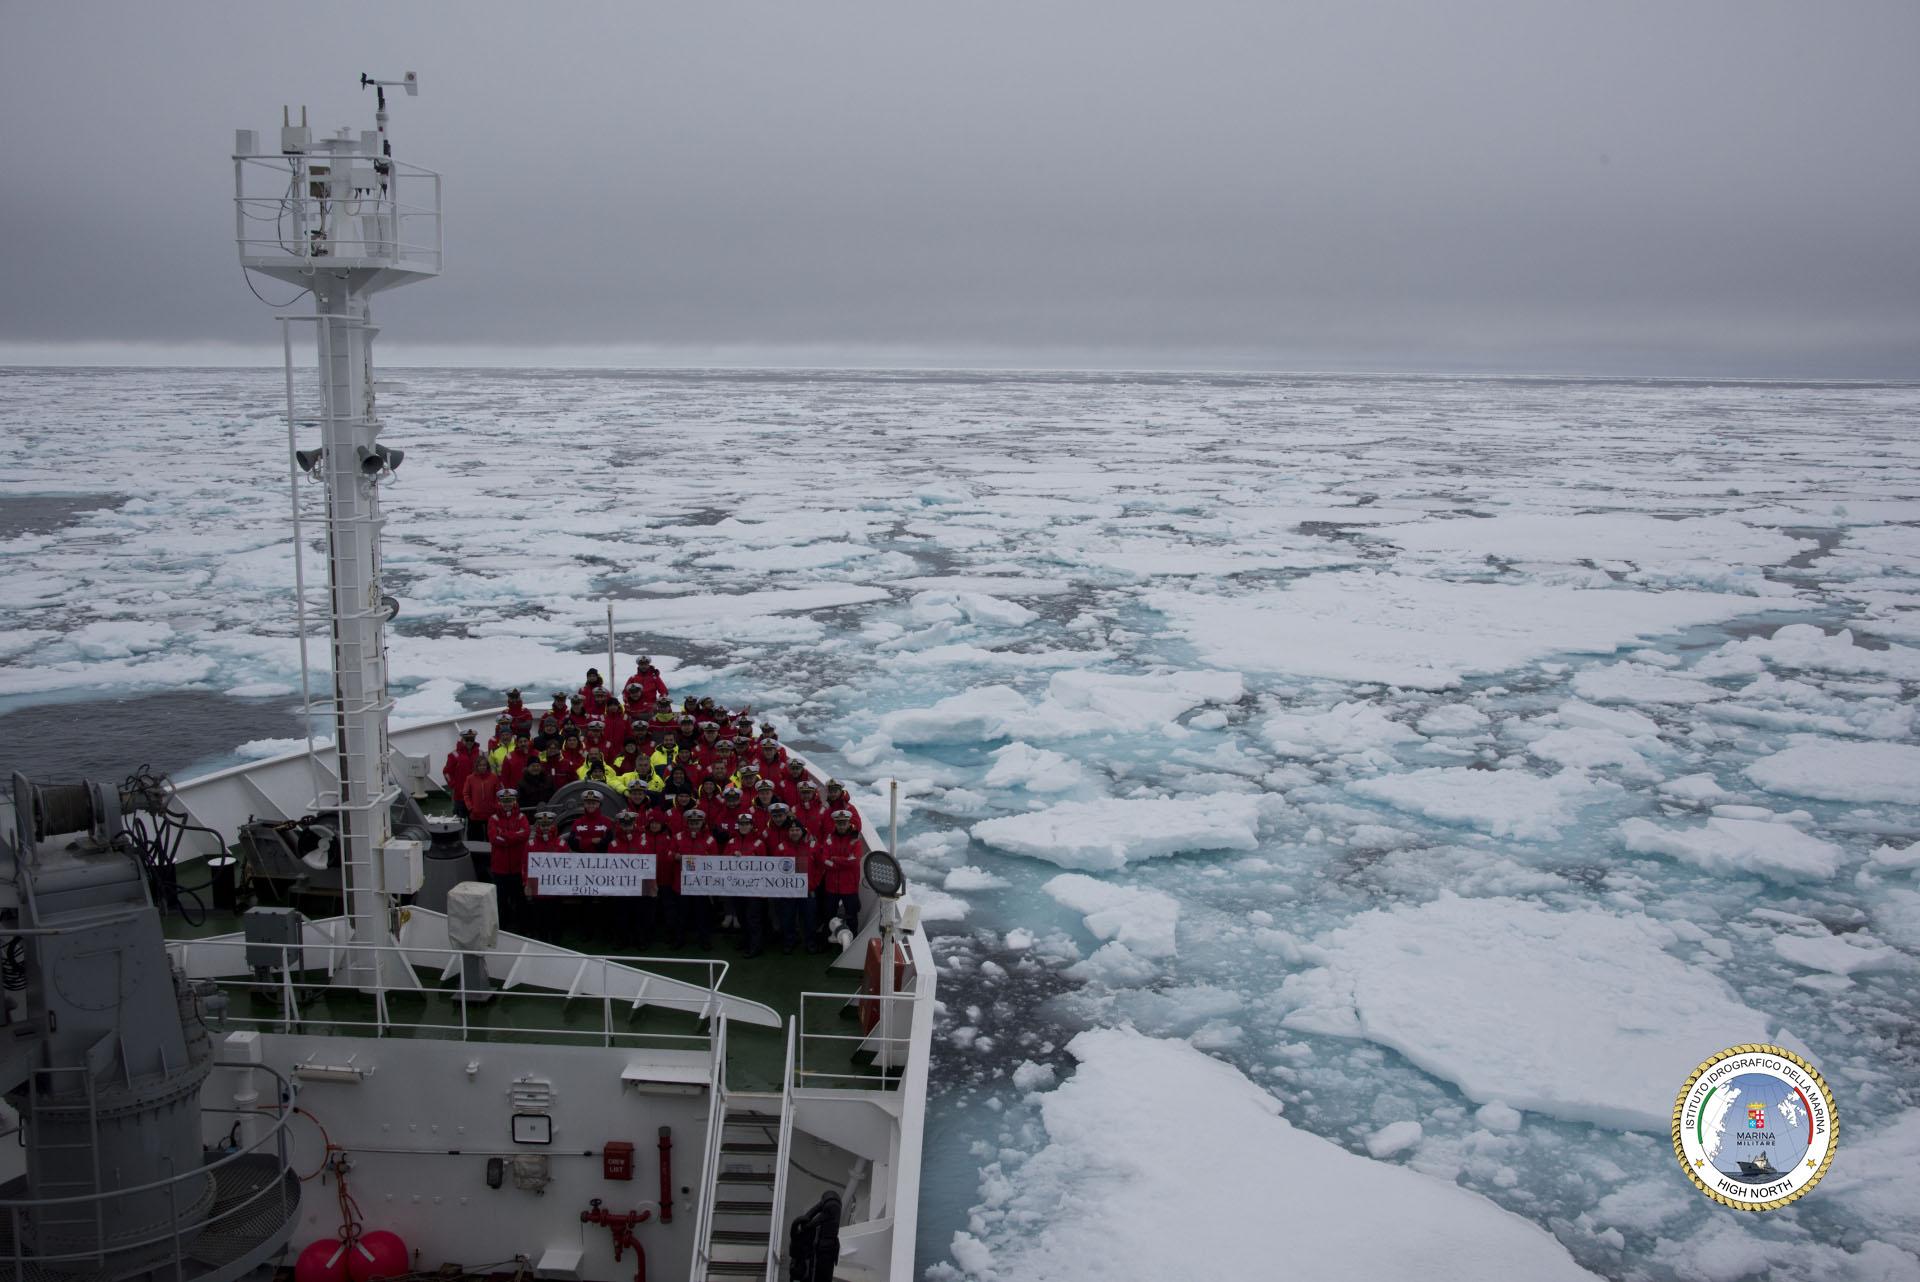 nave alliance ghiacci